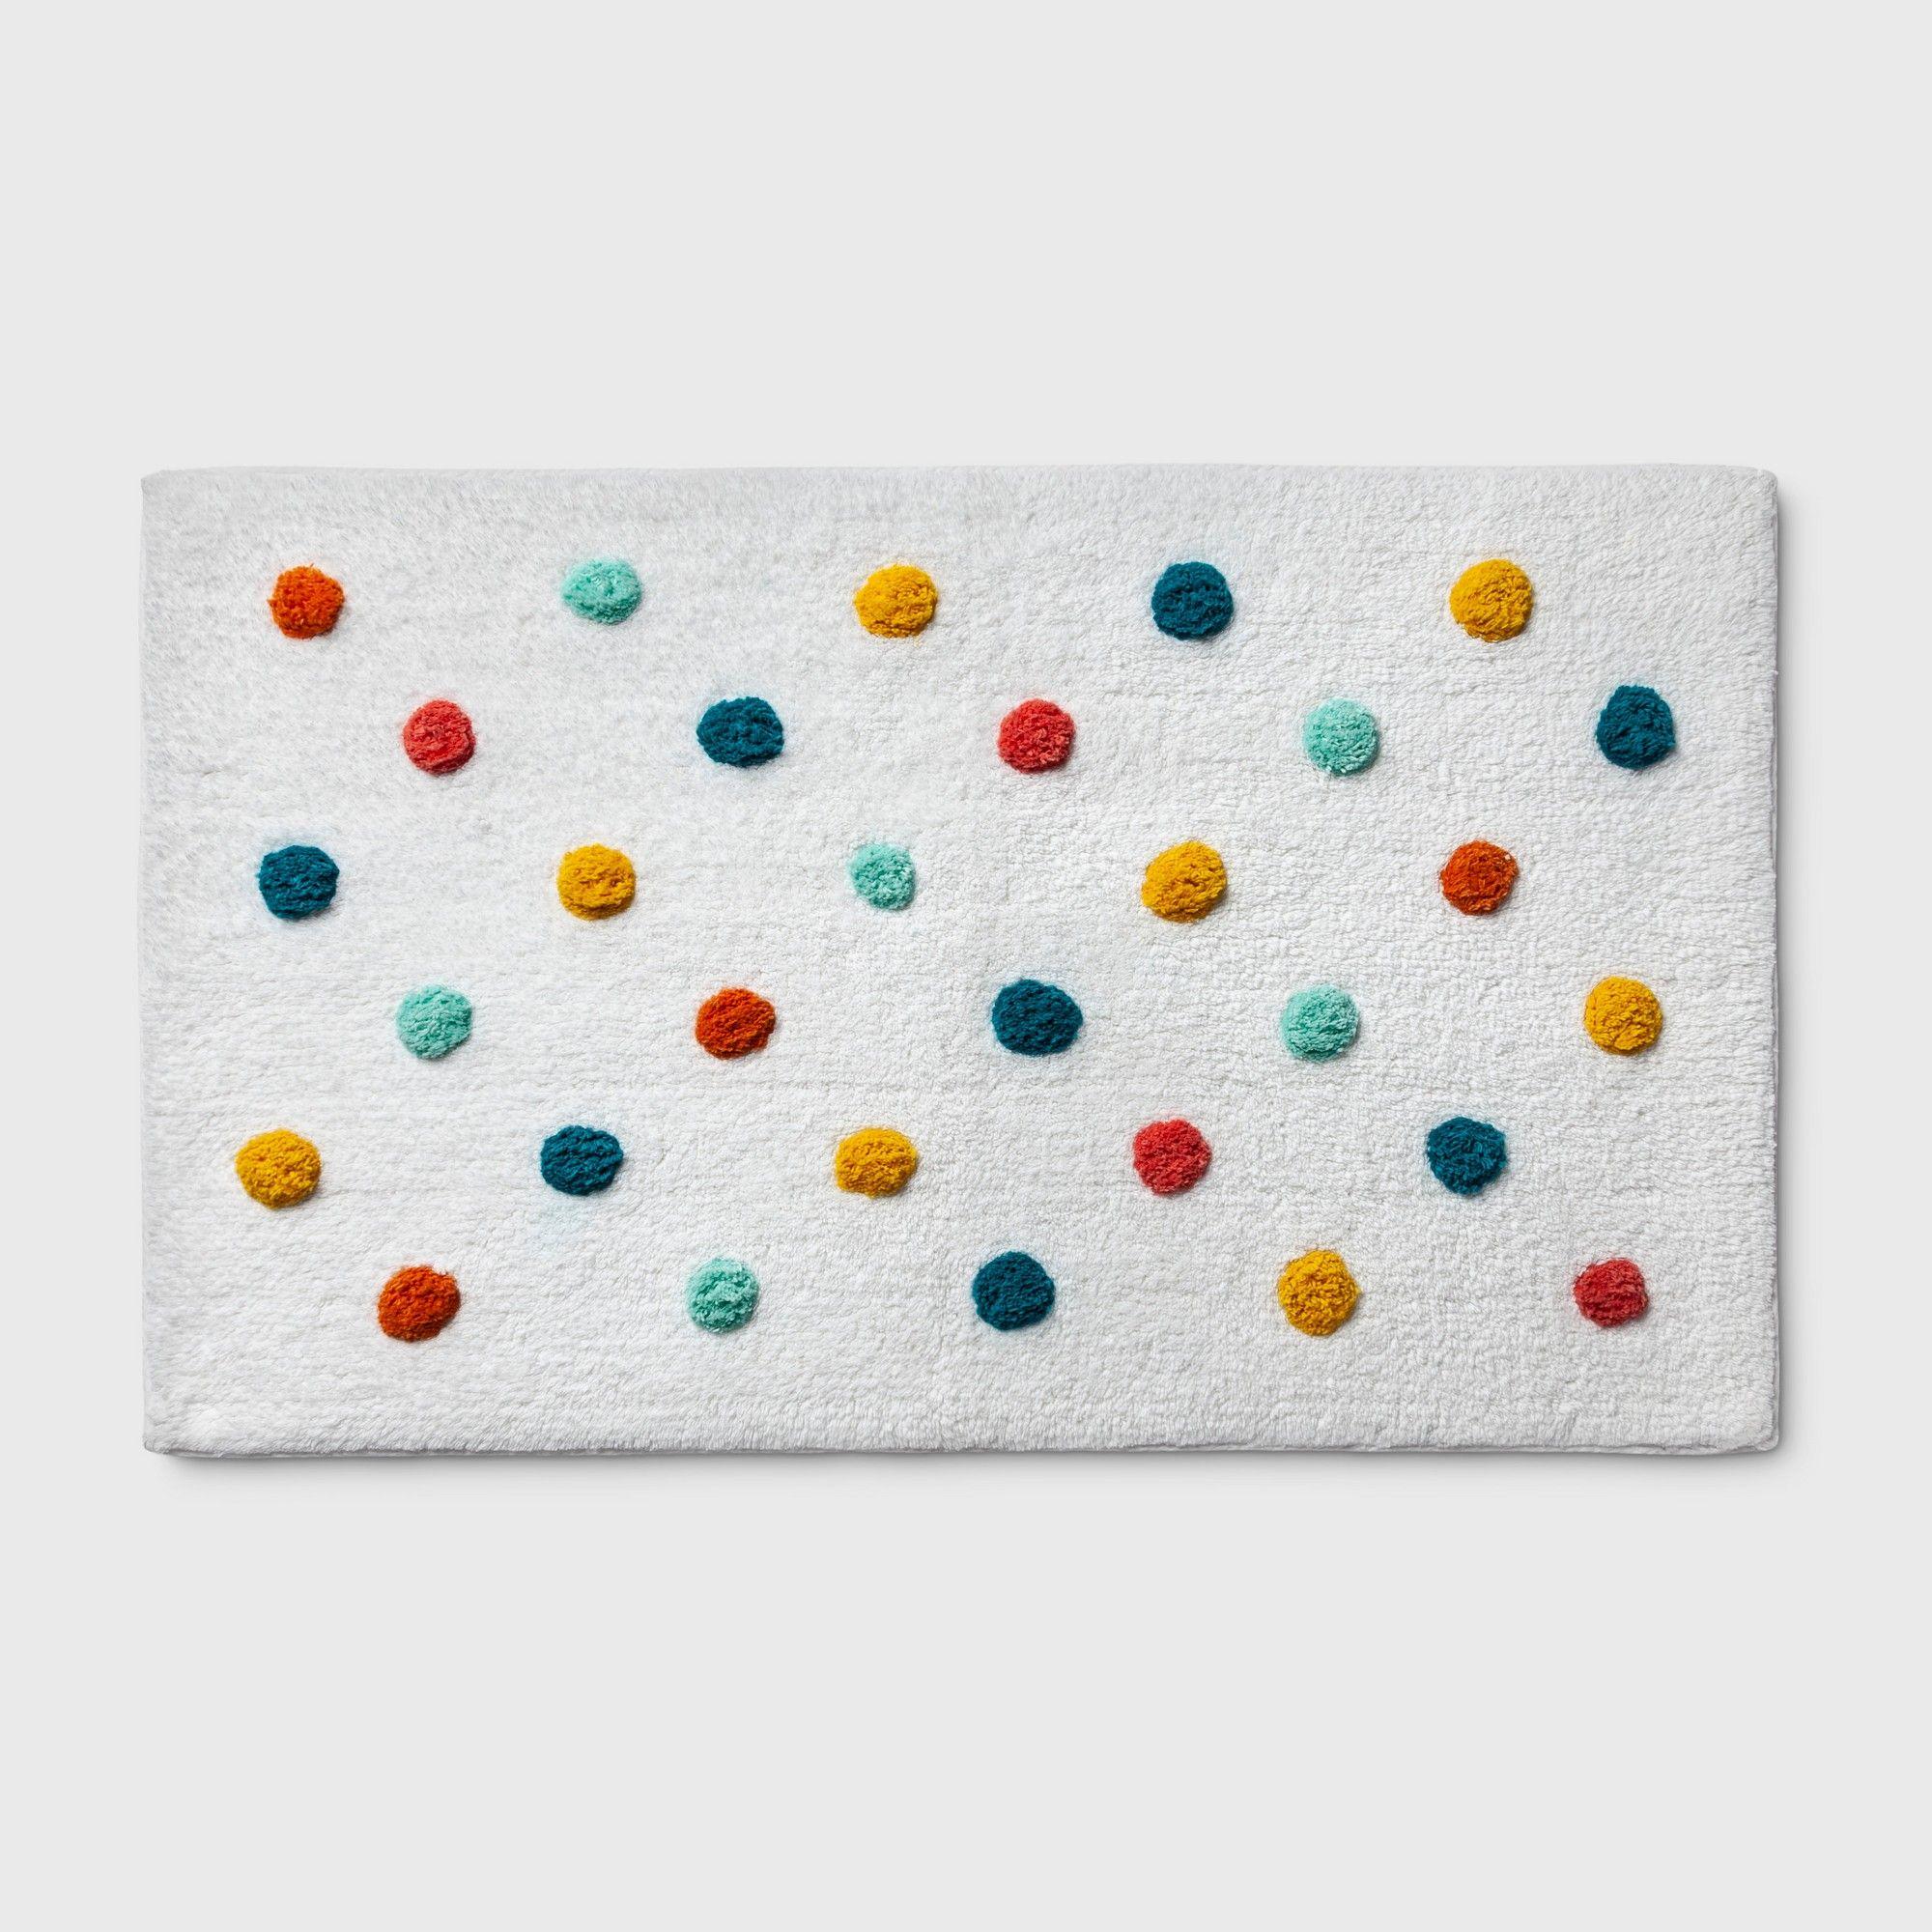 Polka Dot Bath Rug Green Pillowfort Adult Unisex In 2020